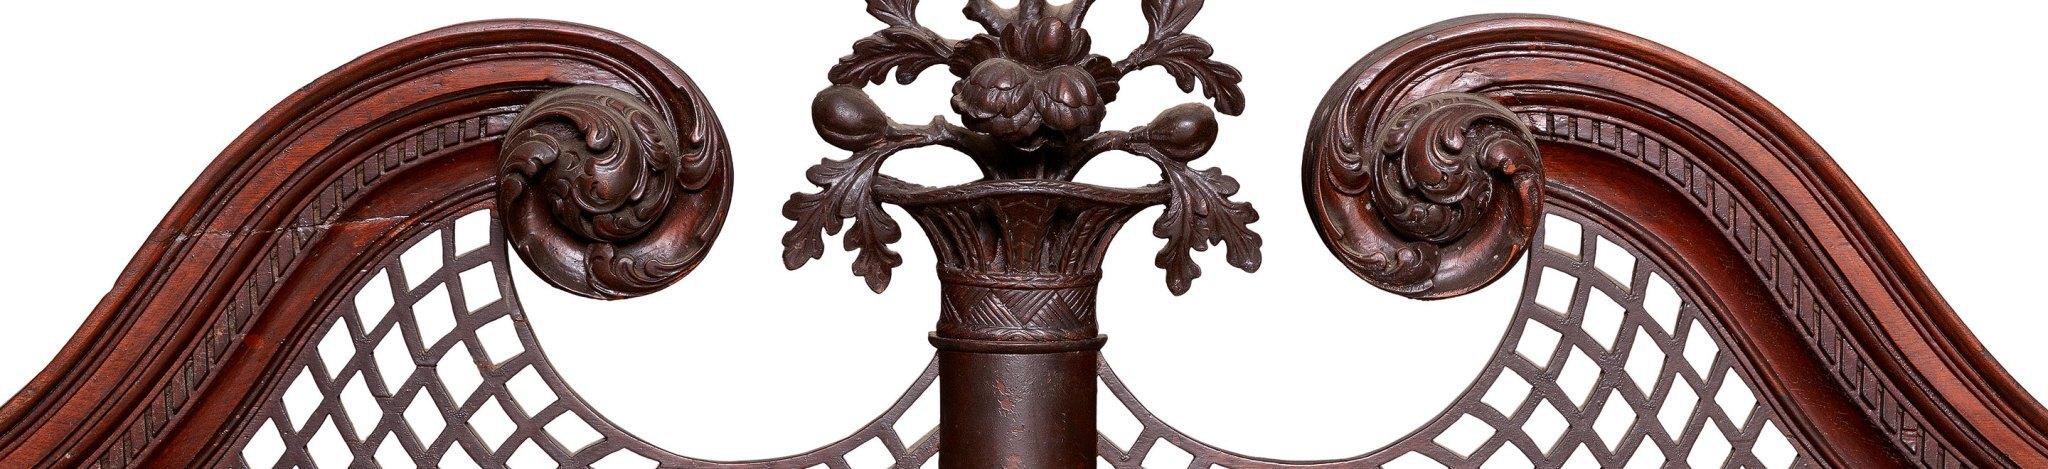 Important Americana: Furniture and Folk Art